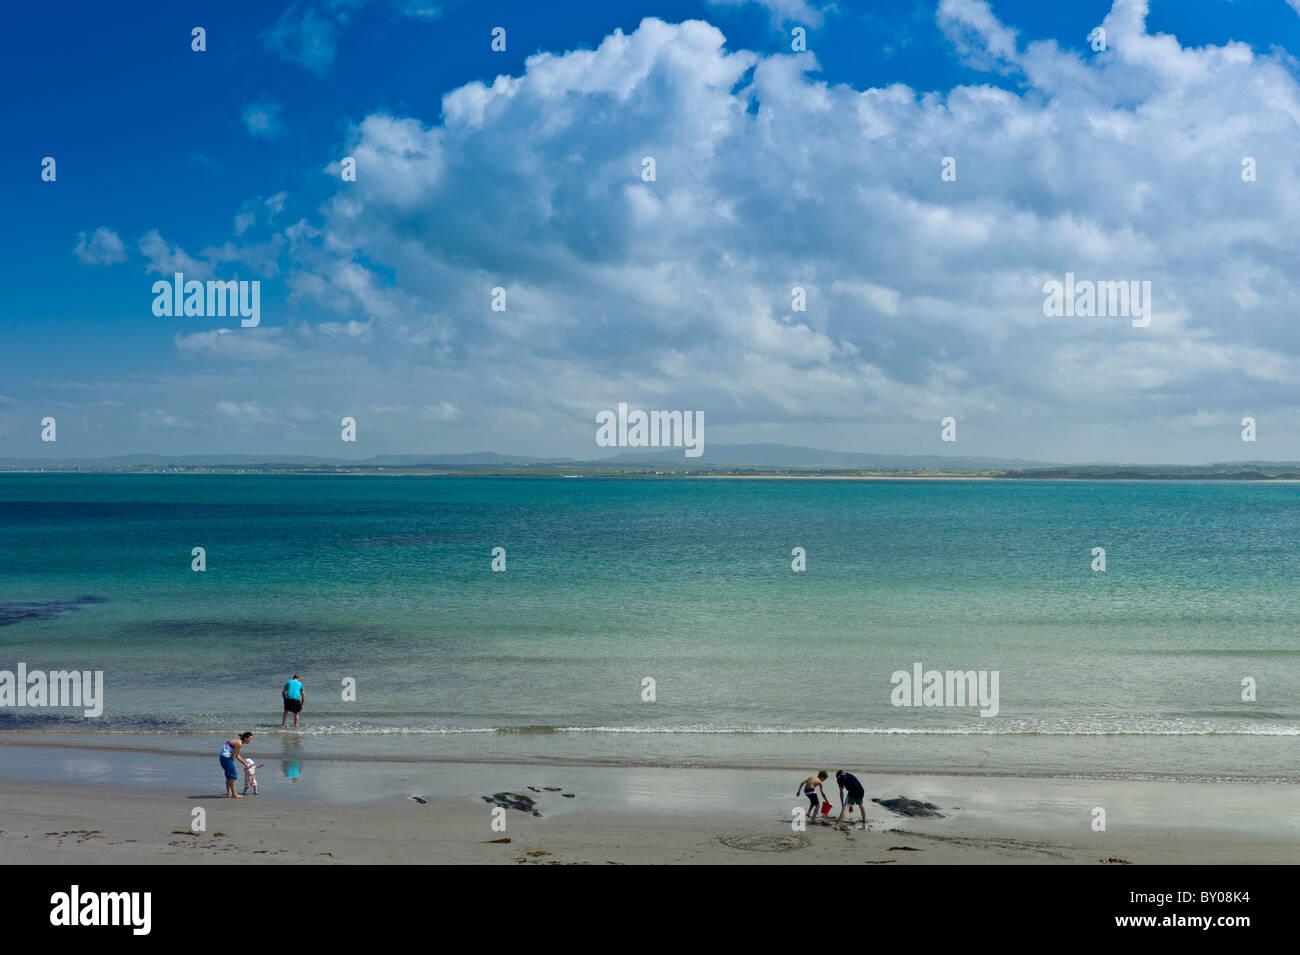 Family fun at the sandy beach on the west coast near Doonbeg, County Clare, West Coast of Ireland - Stock Image